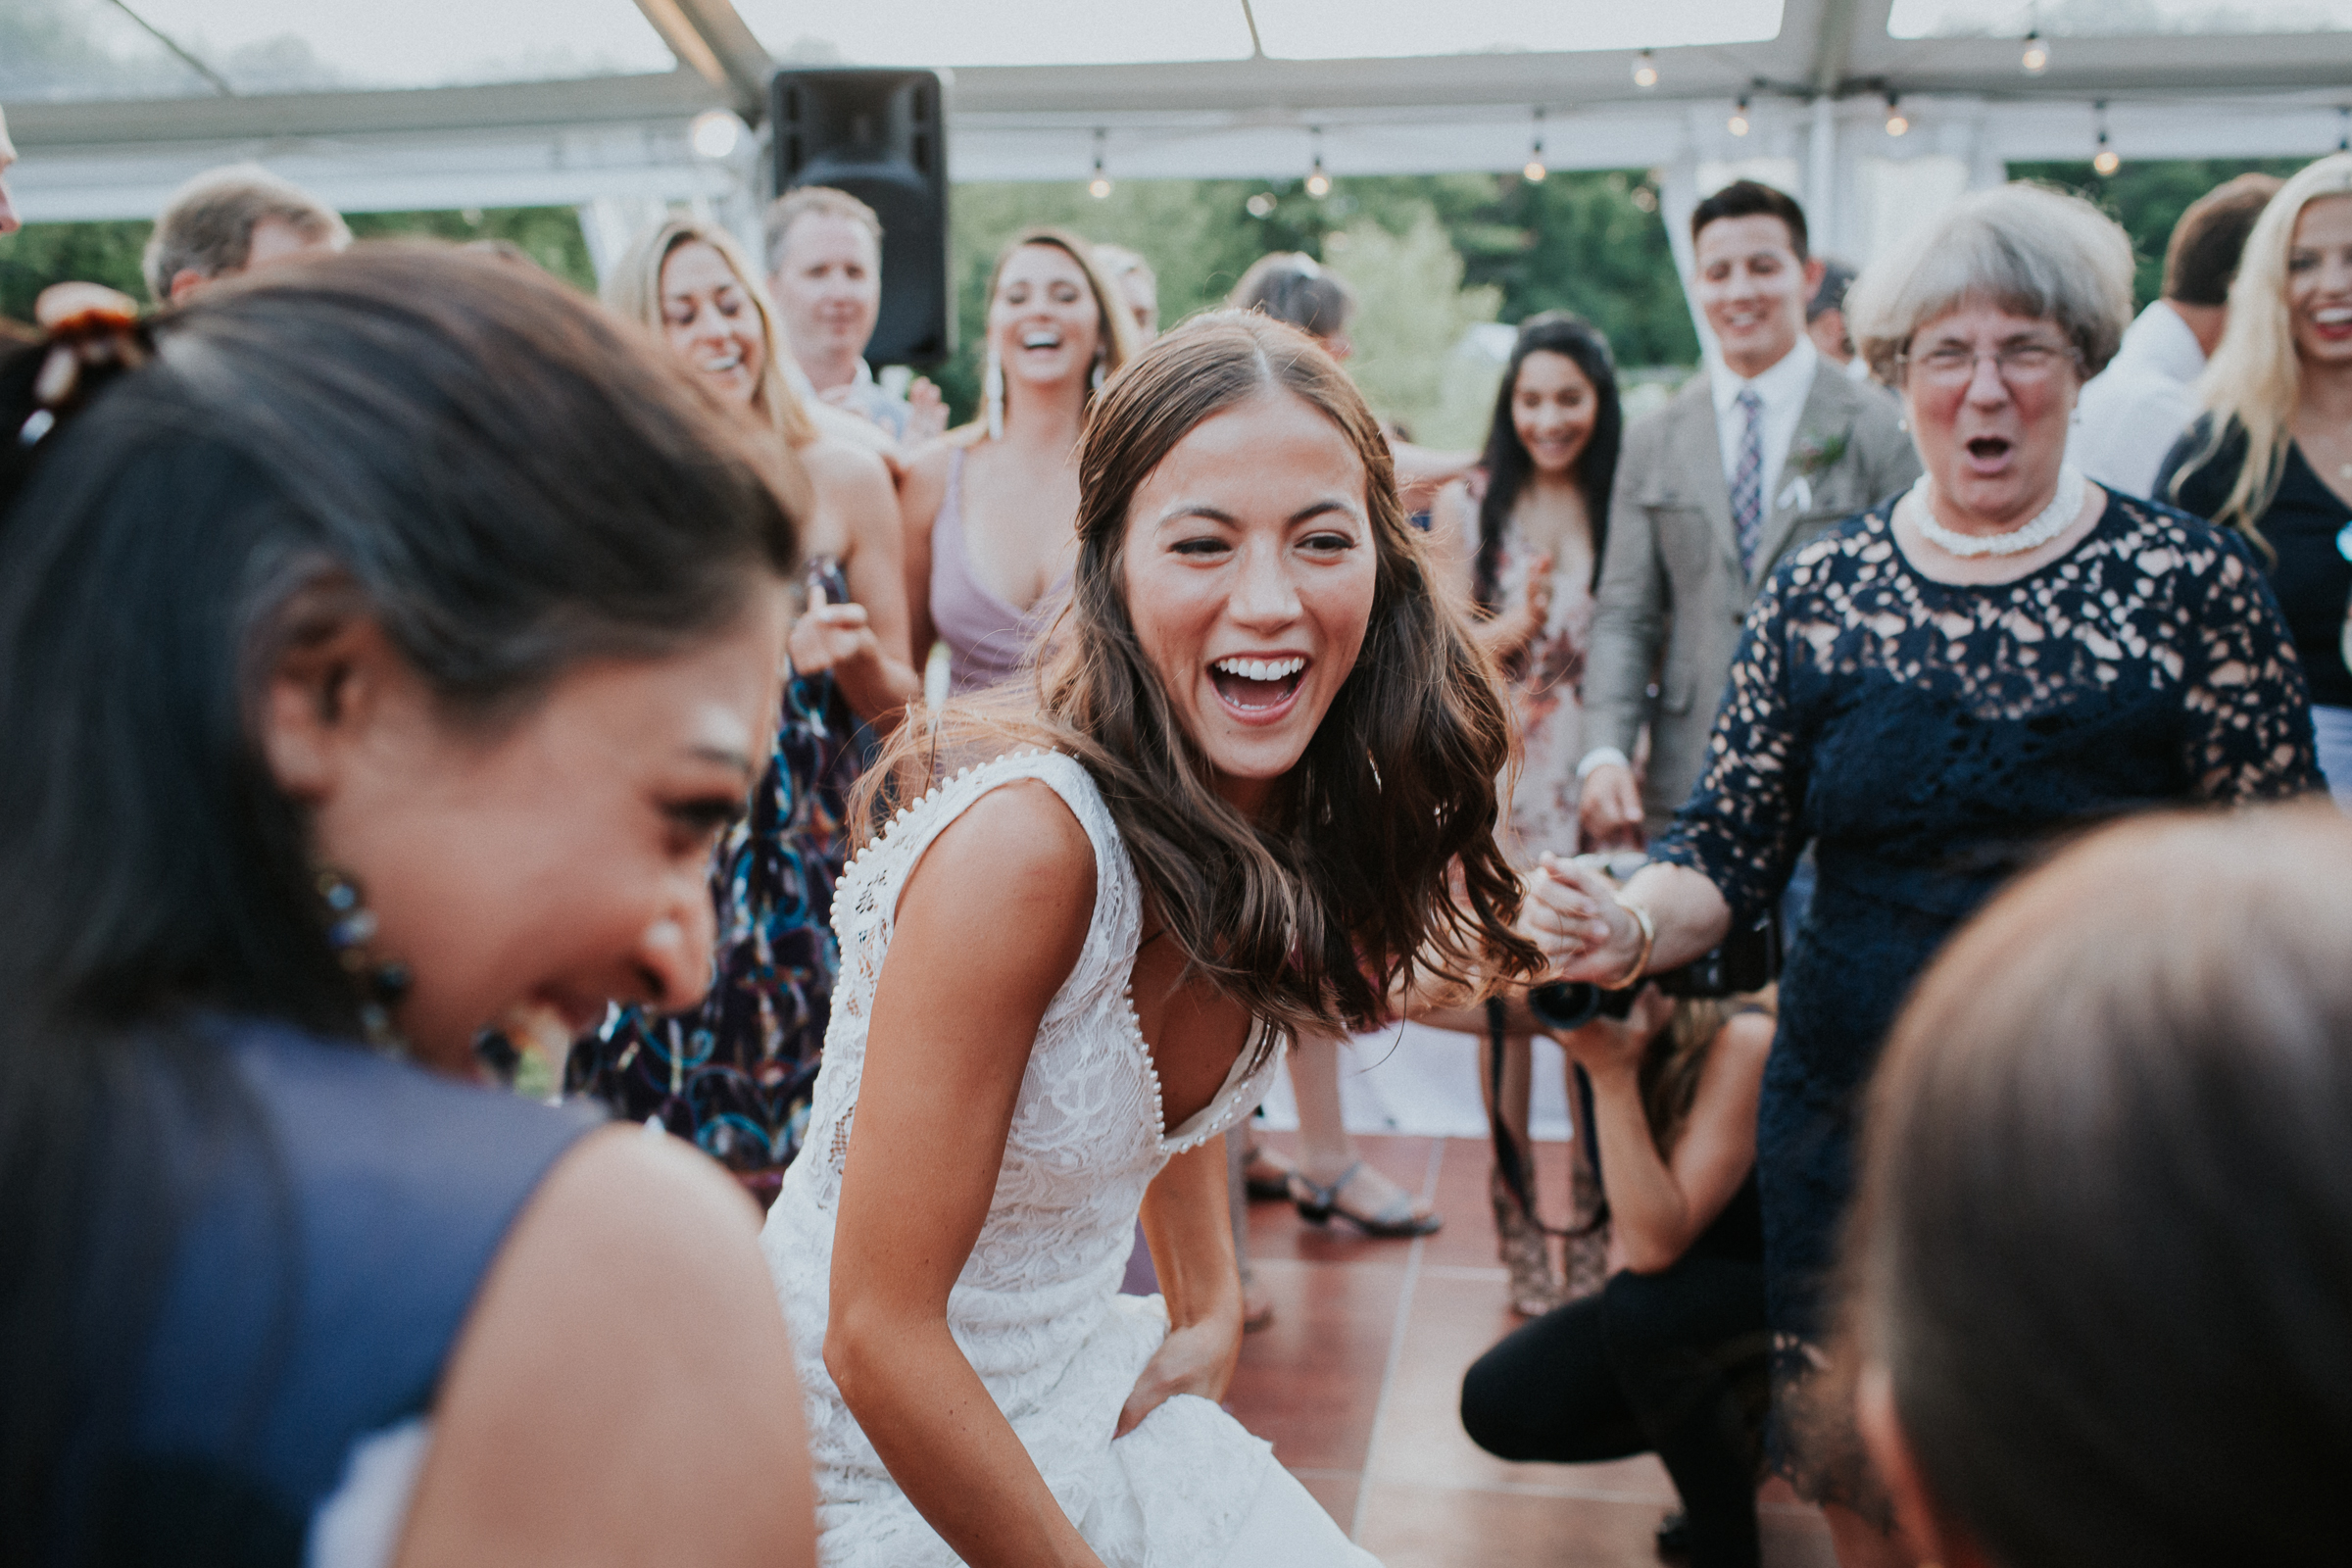 Marianmade-Farm-Wiscasset-Maine-Fine-Art-Documentary-Wedding-Photographer-Elvira-Kalviste-Photography-139.jpg